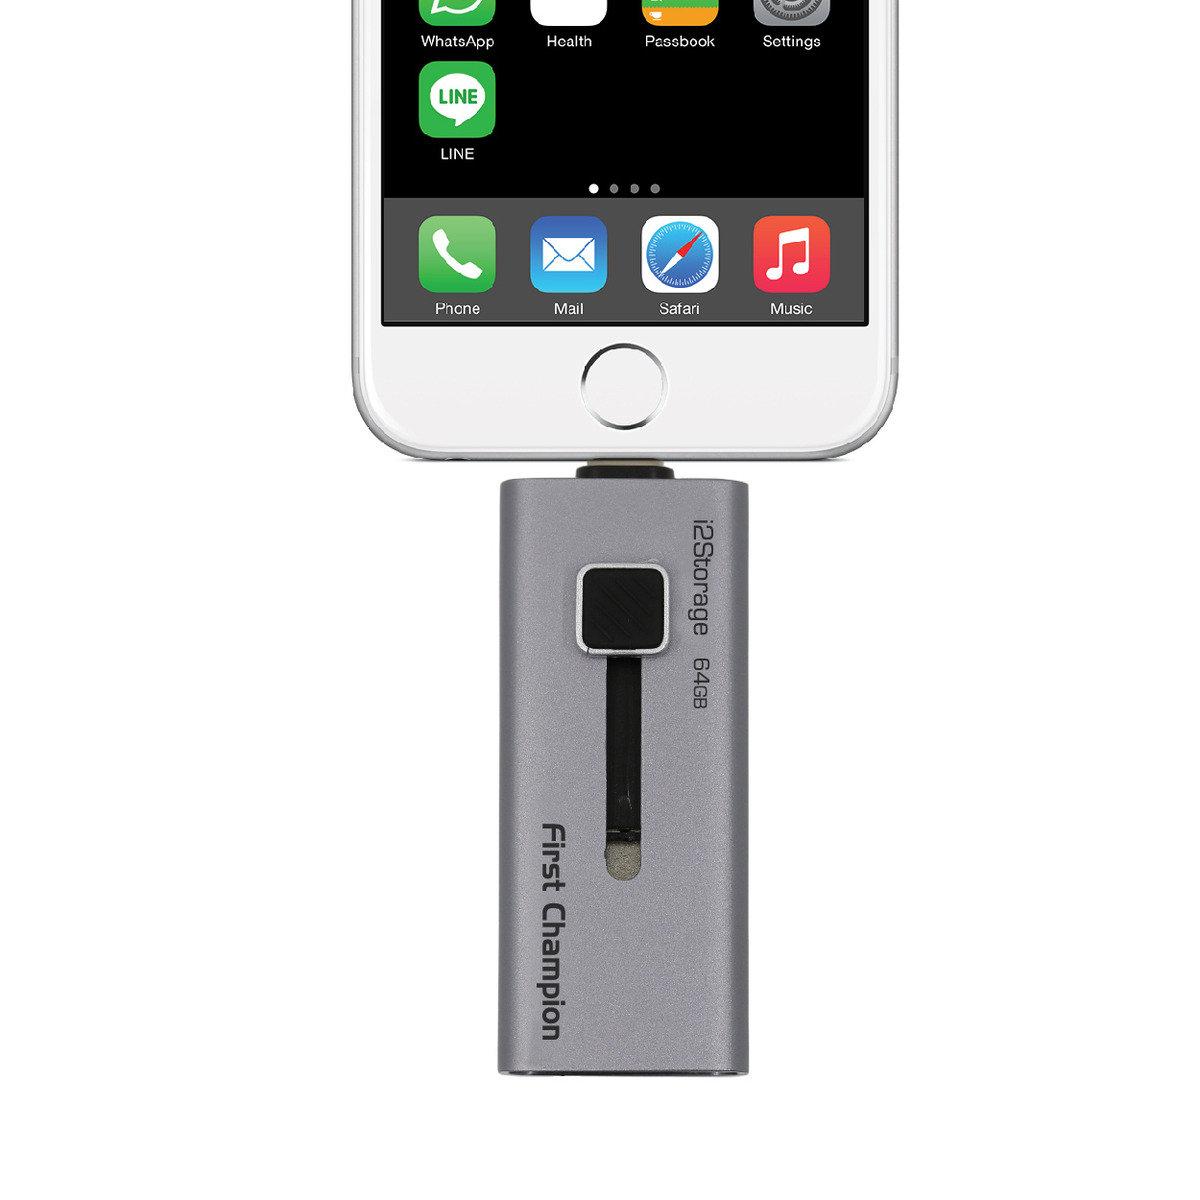 蘋果專用Lightning USB 3.0 隨身碟 i2S30-64GB